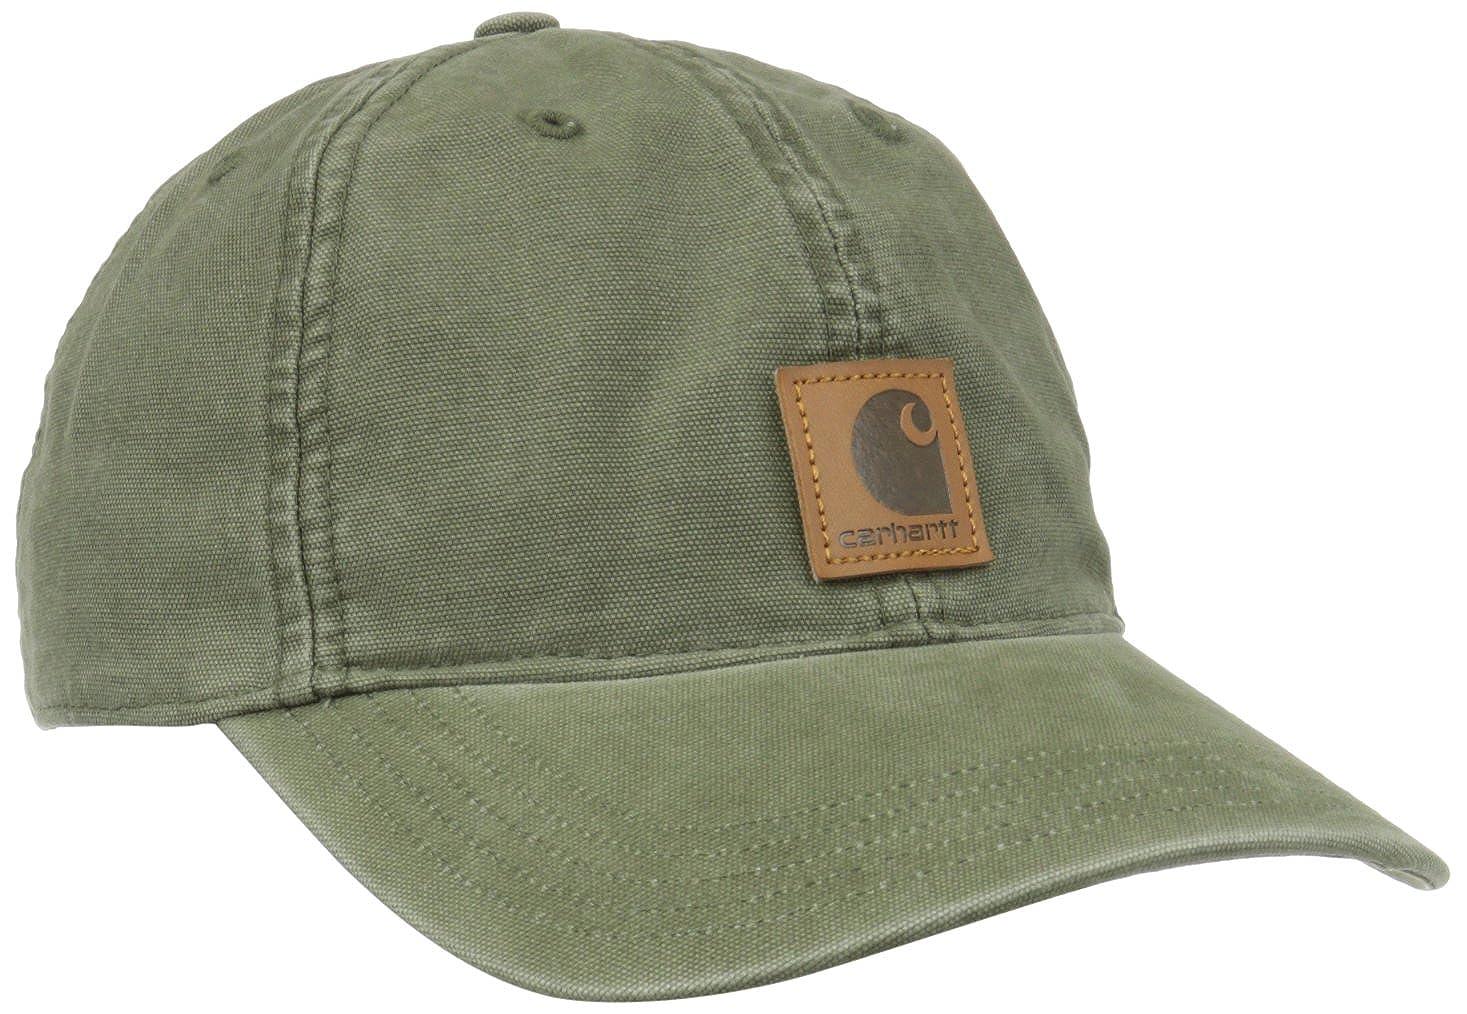 640f03b7804 Carhartt mens odessa cap clothing jpg 1467x1014 Carhartt baseball hat